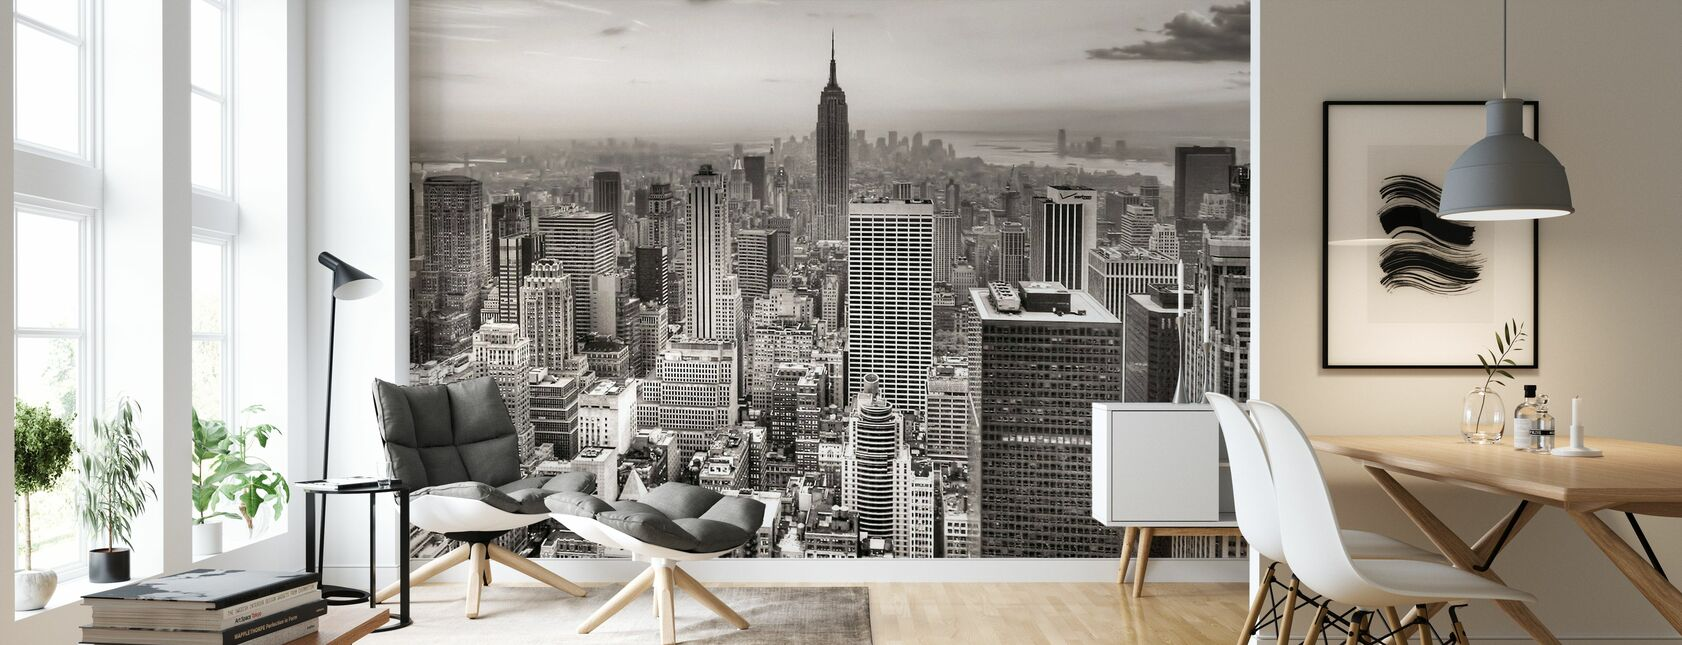 New York City, Verenigde Staten - Behang - Woonkamer